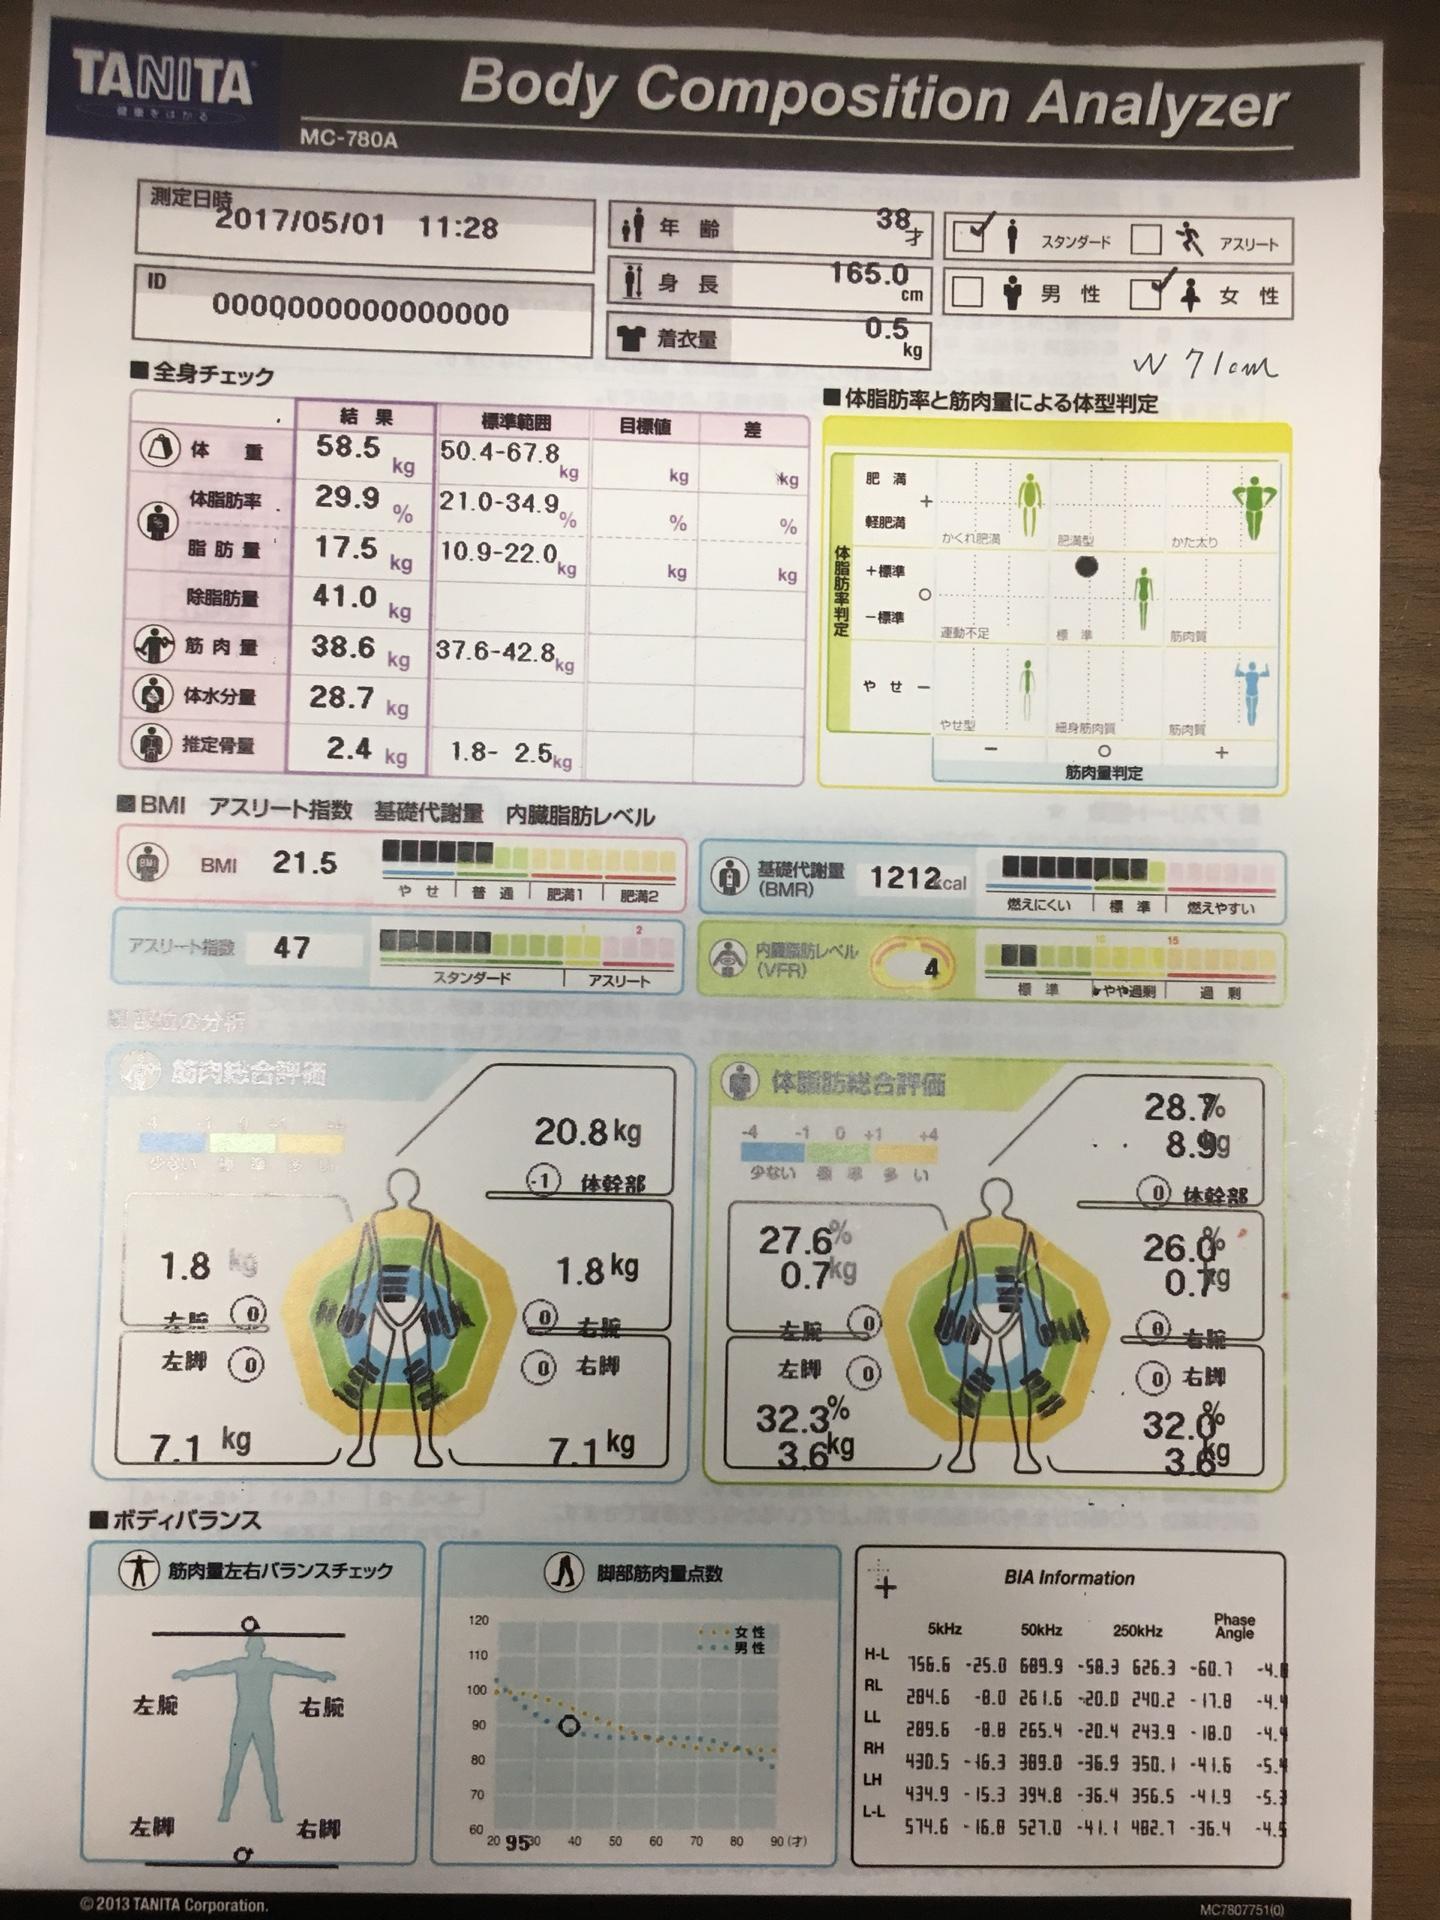 IMG_7249-19-03-18-13-11.JPG